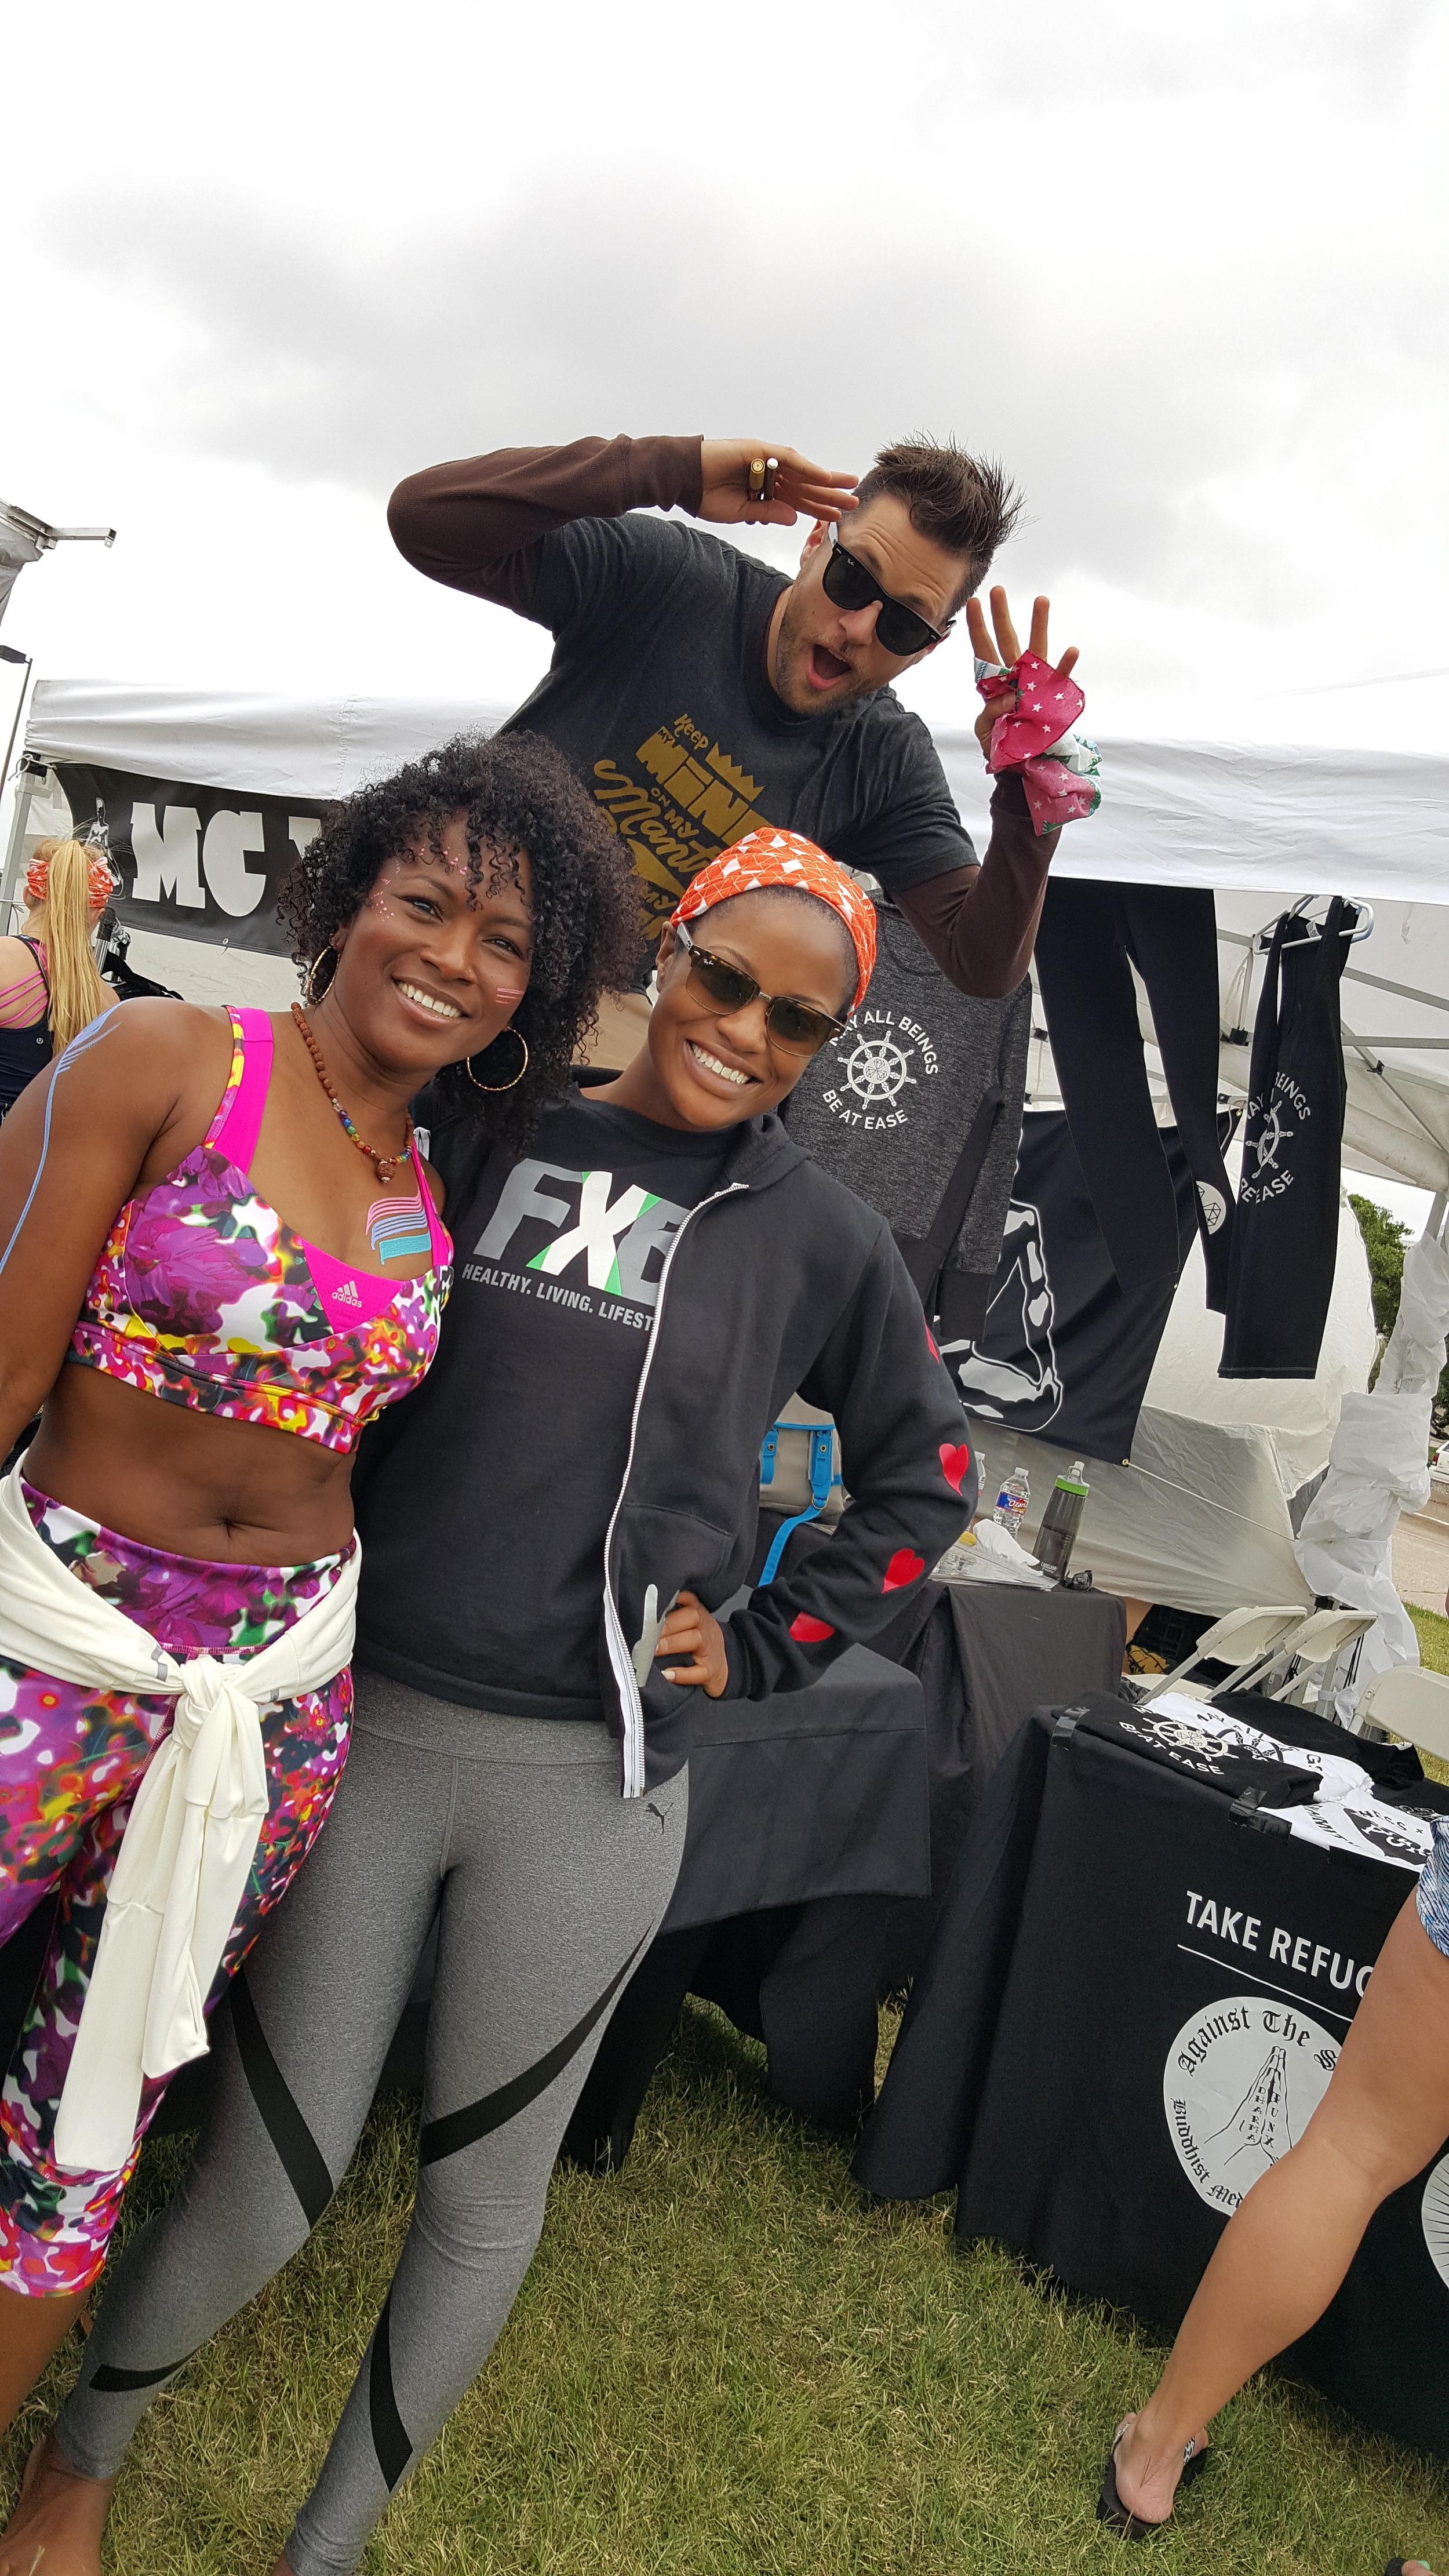 Faith Hunter, MC Yogi, and Fit X Brit. Image FitXBrit